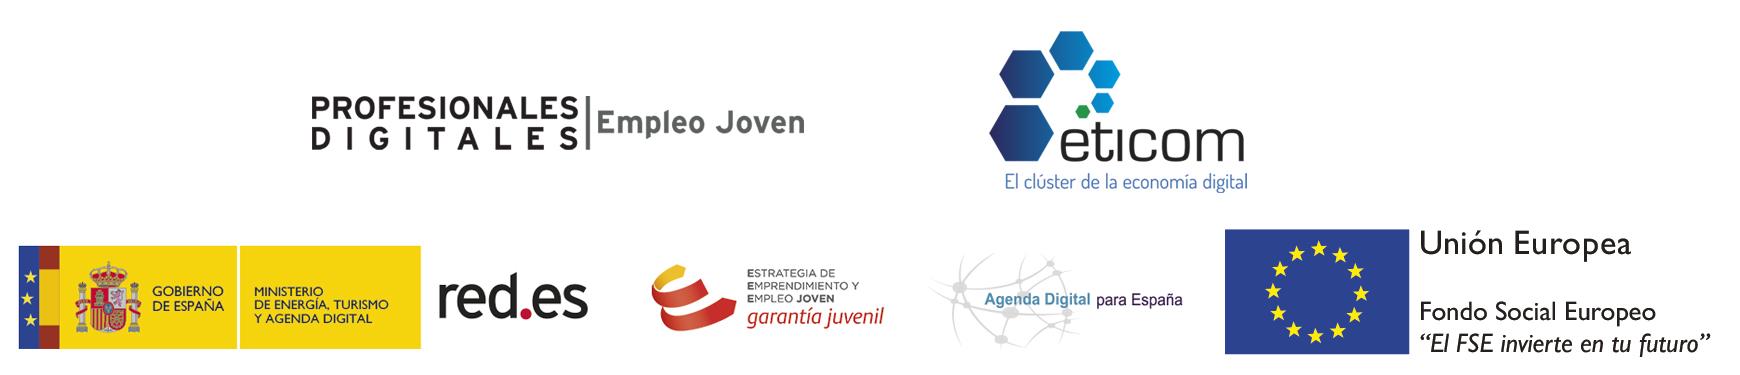 Logos programa Red.es